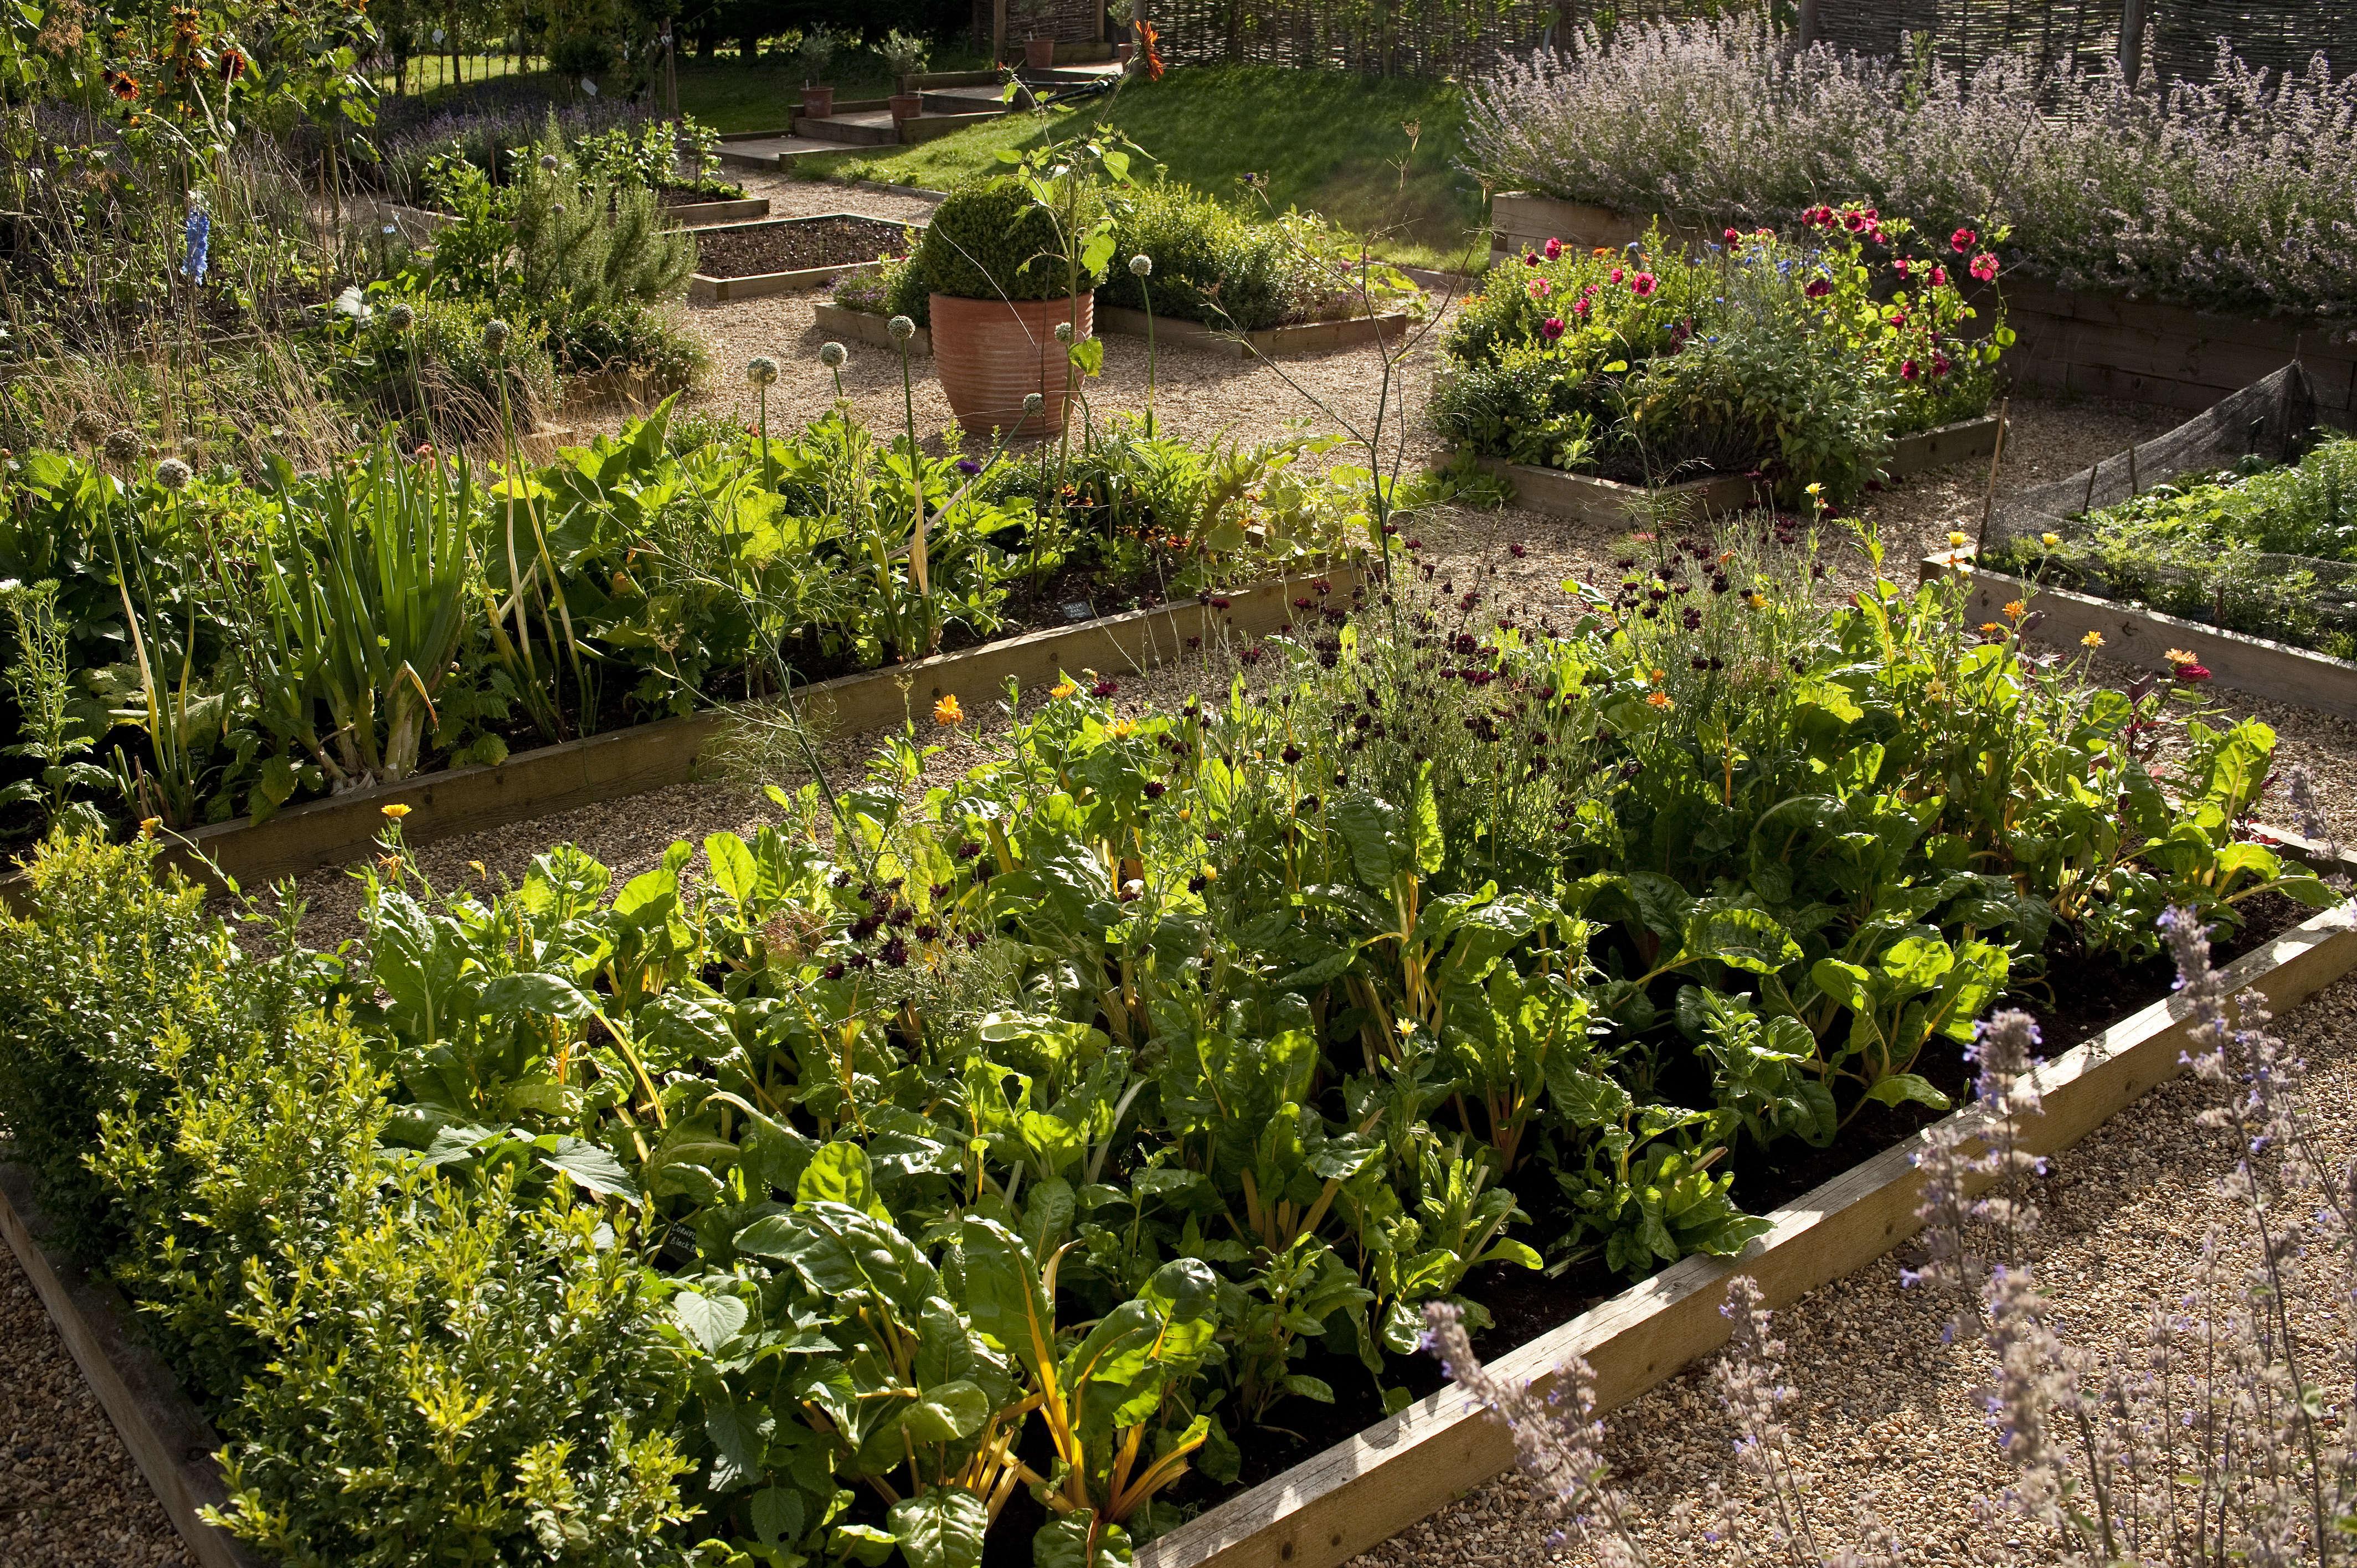 darsham_nurseries_raised_beds_kevin_foord_gardenista_KF11454